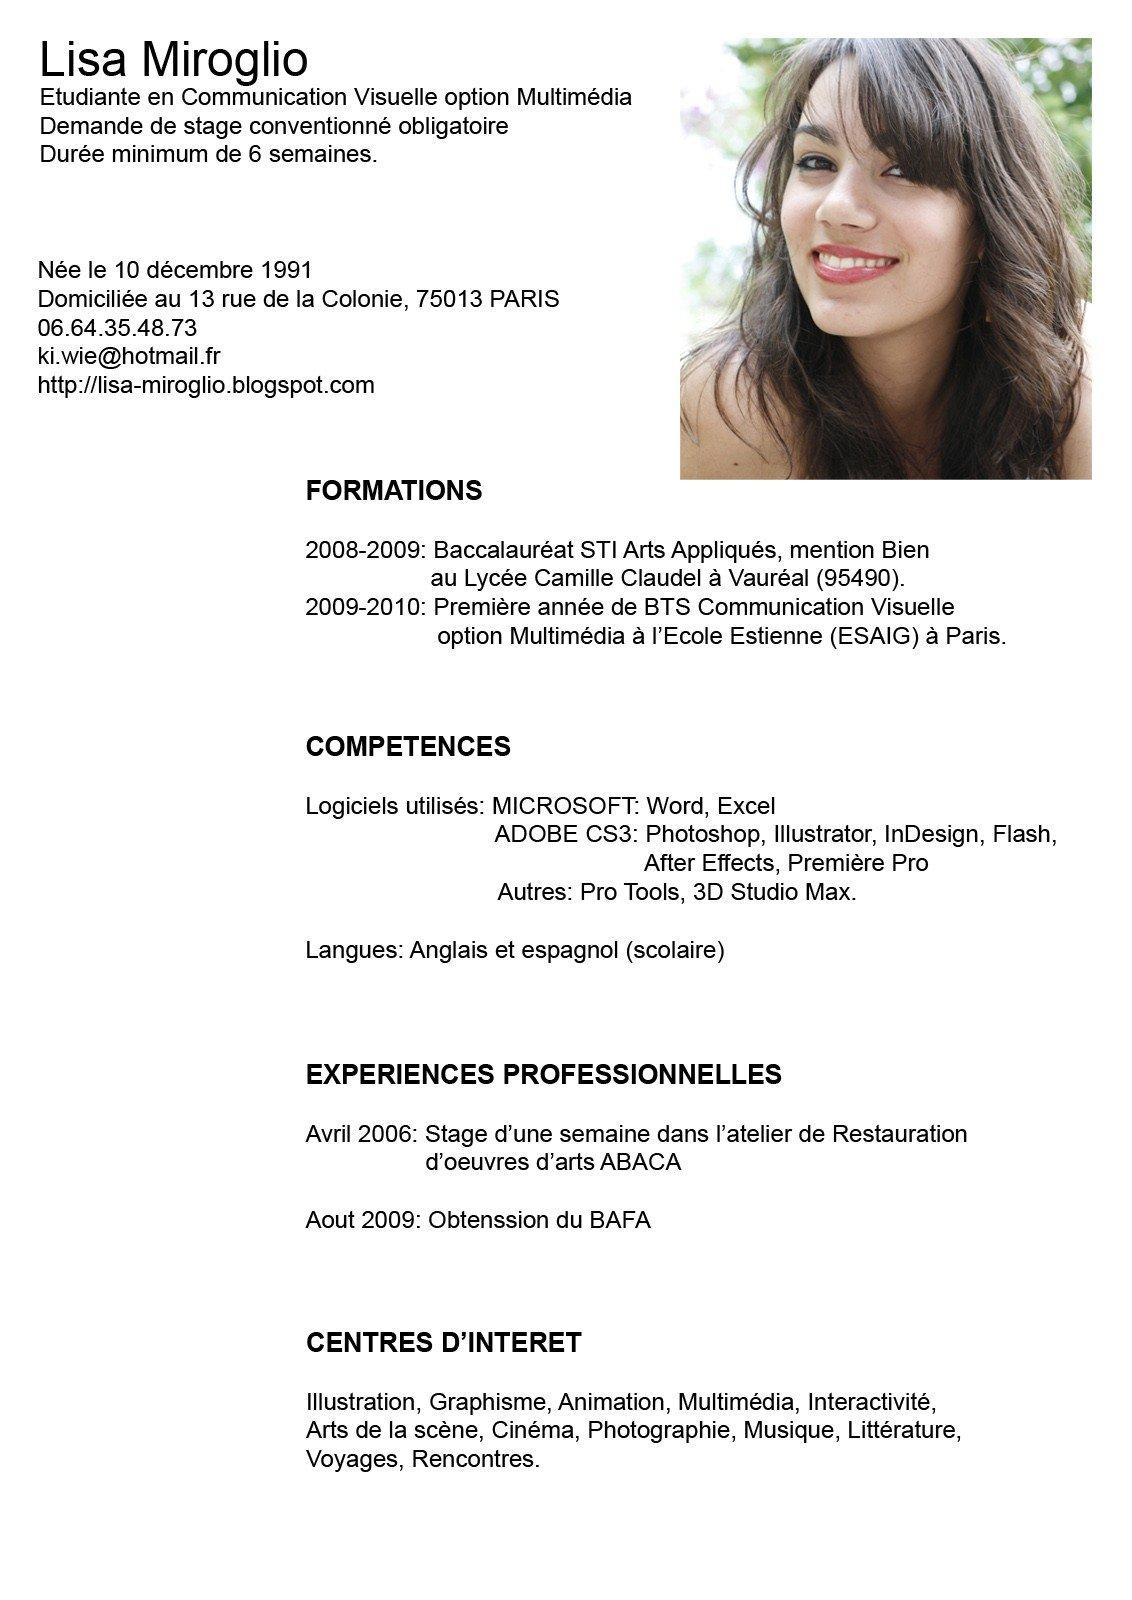 Ejemplos De Curriculum Vitae Jovenes | Resume Pdf Download